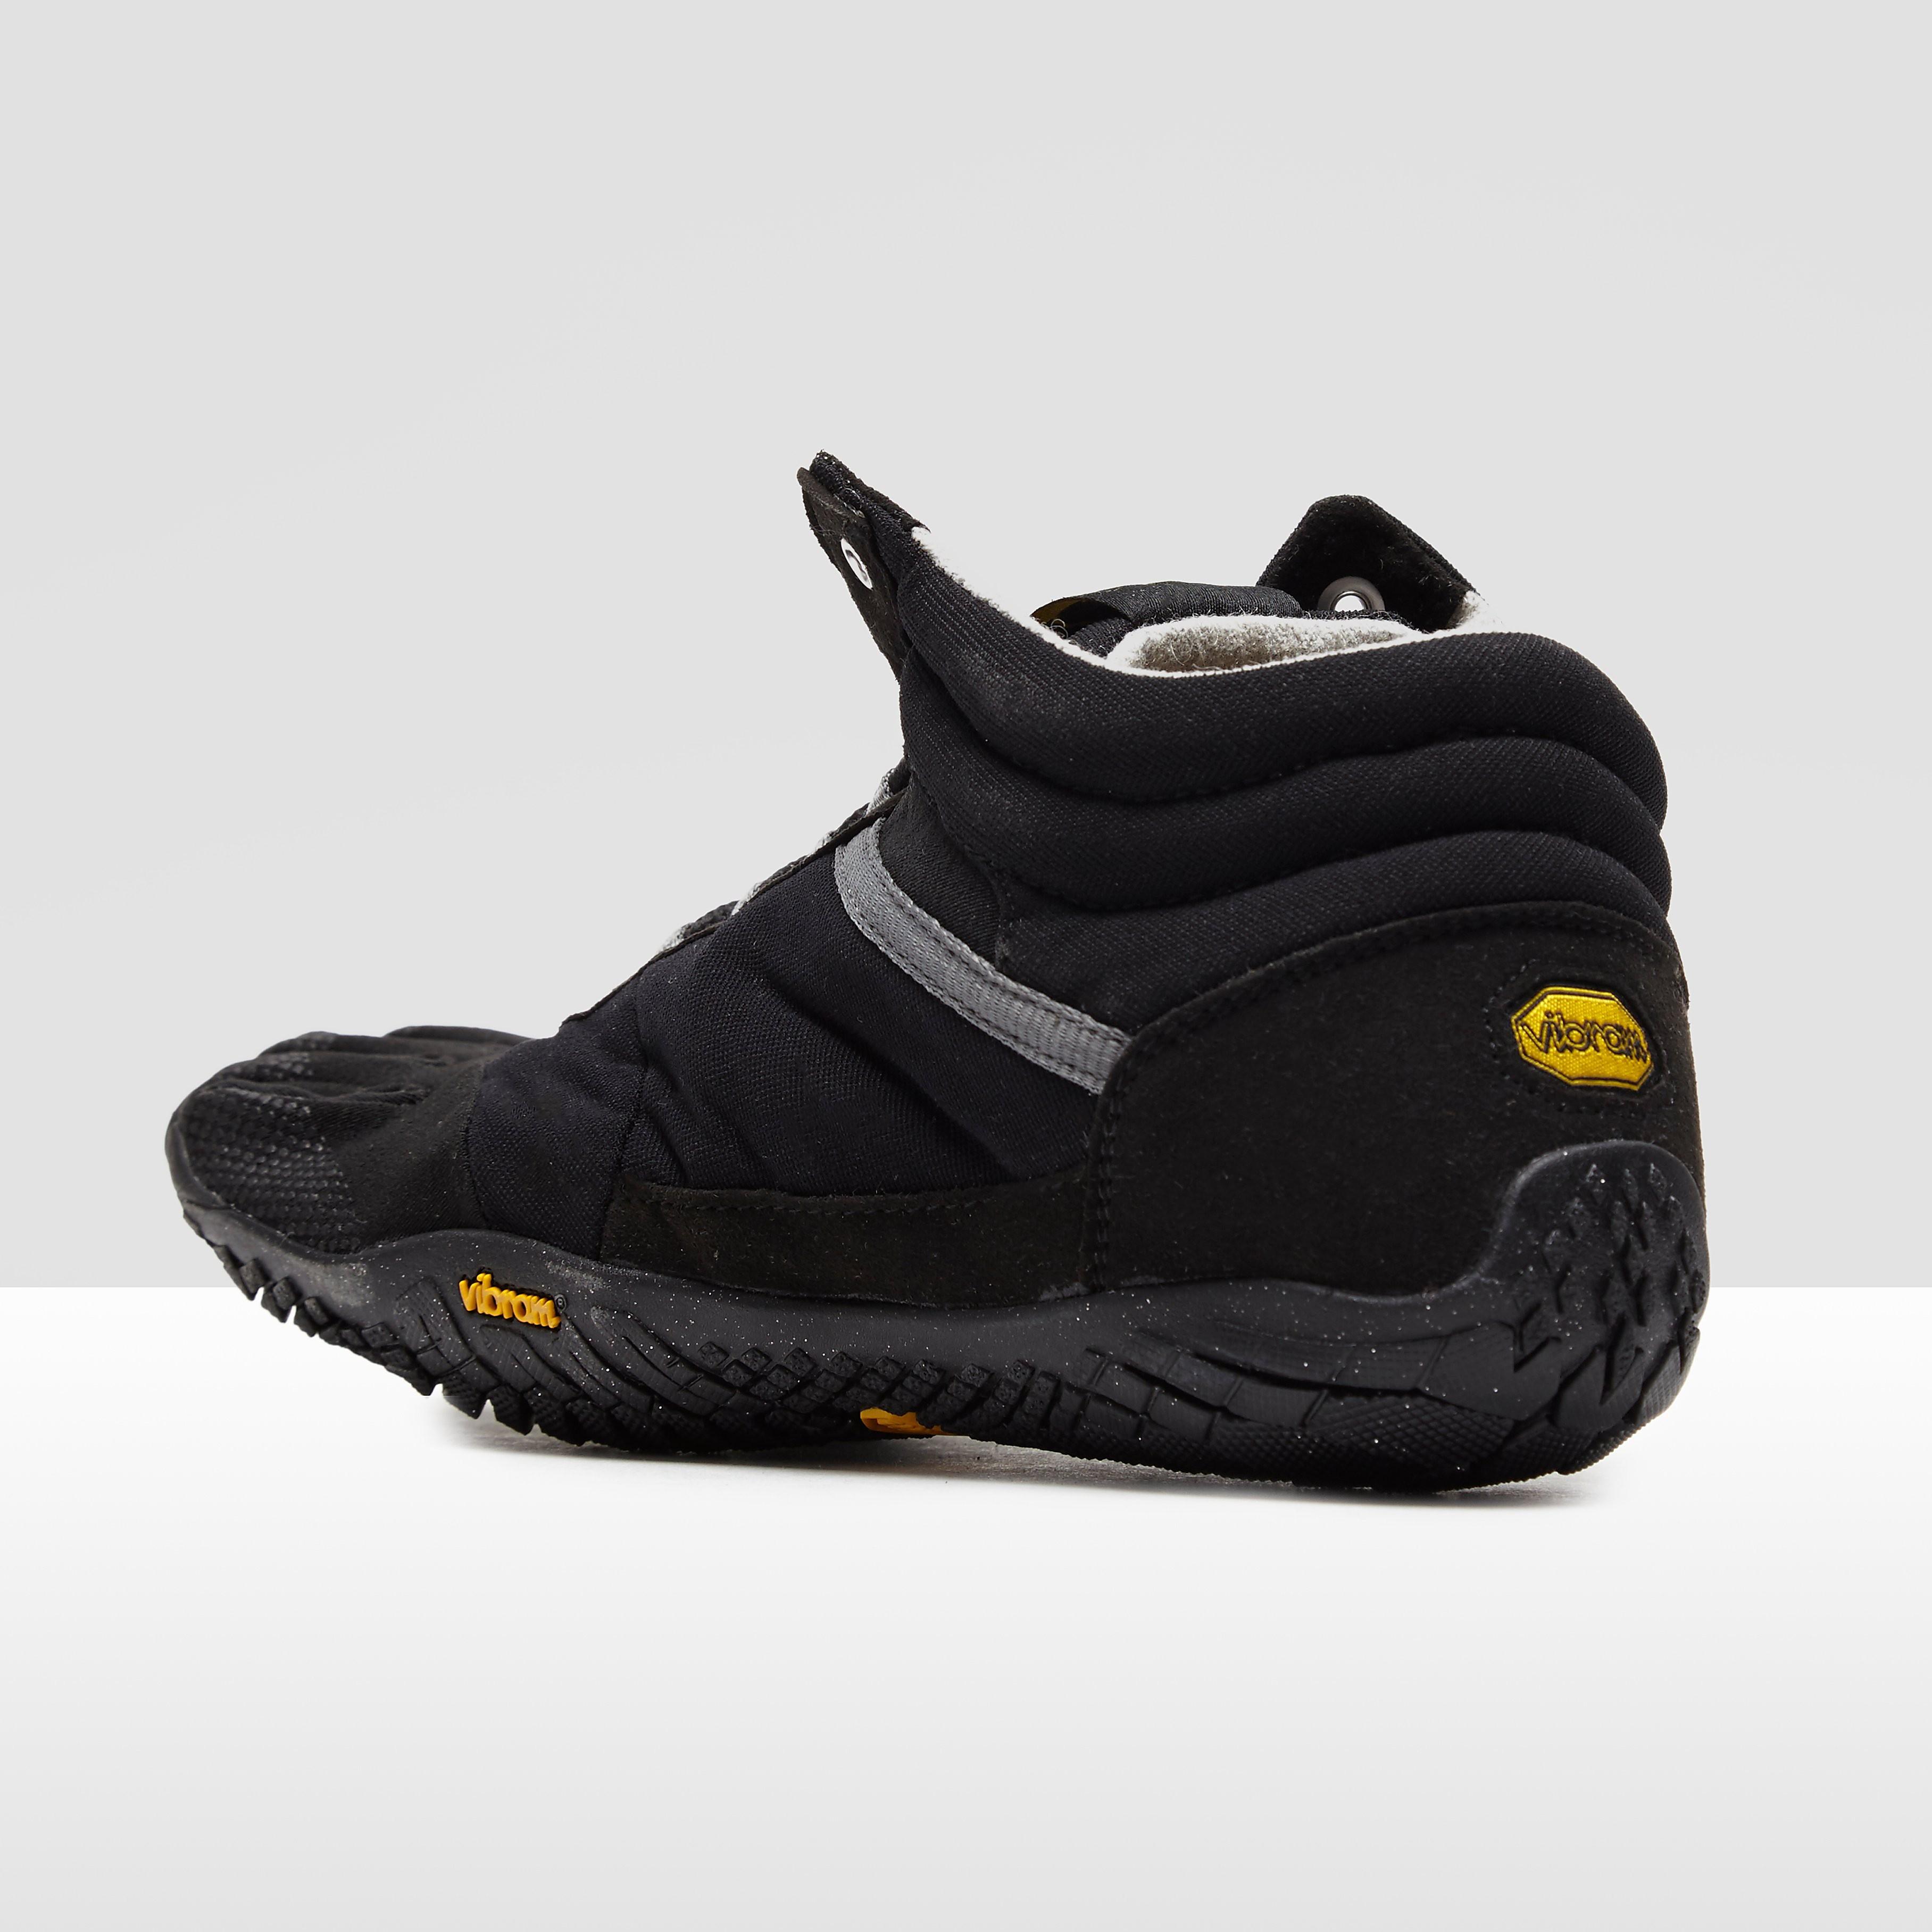 Vibram Five Fingers Trek Ascent Insulated Trail Running Shoes